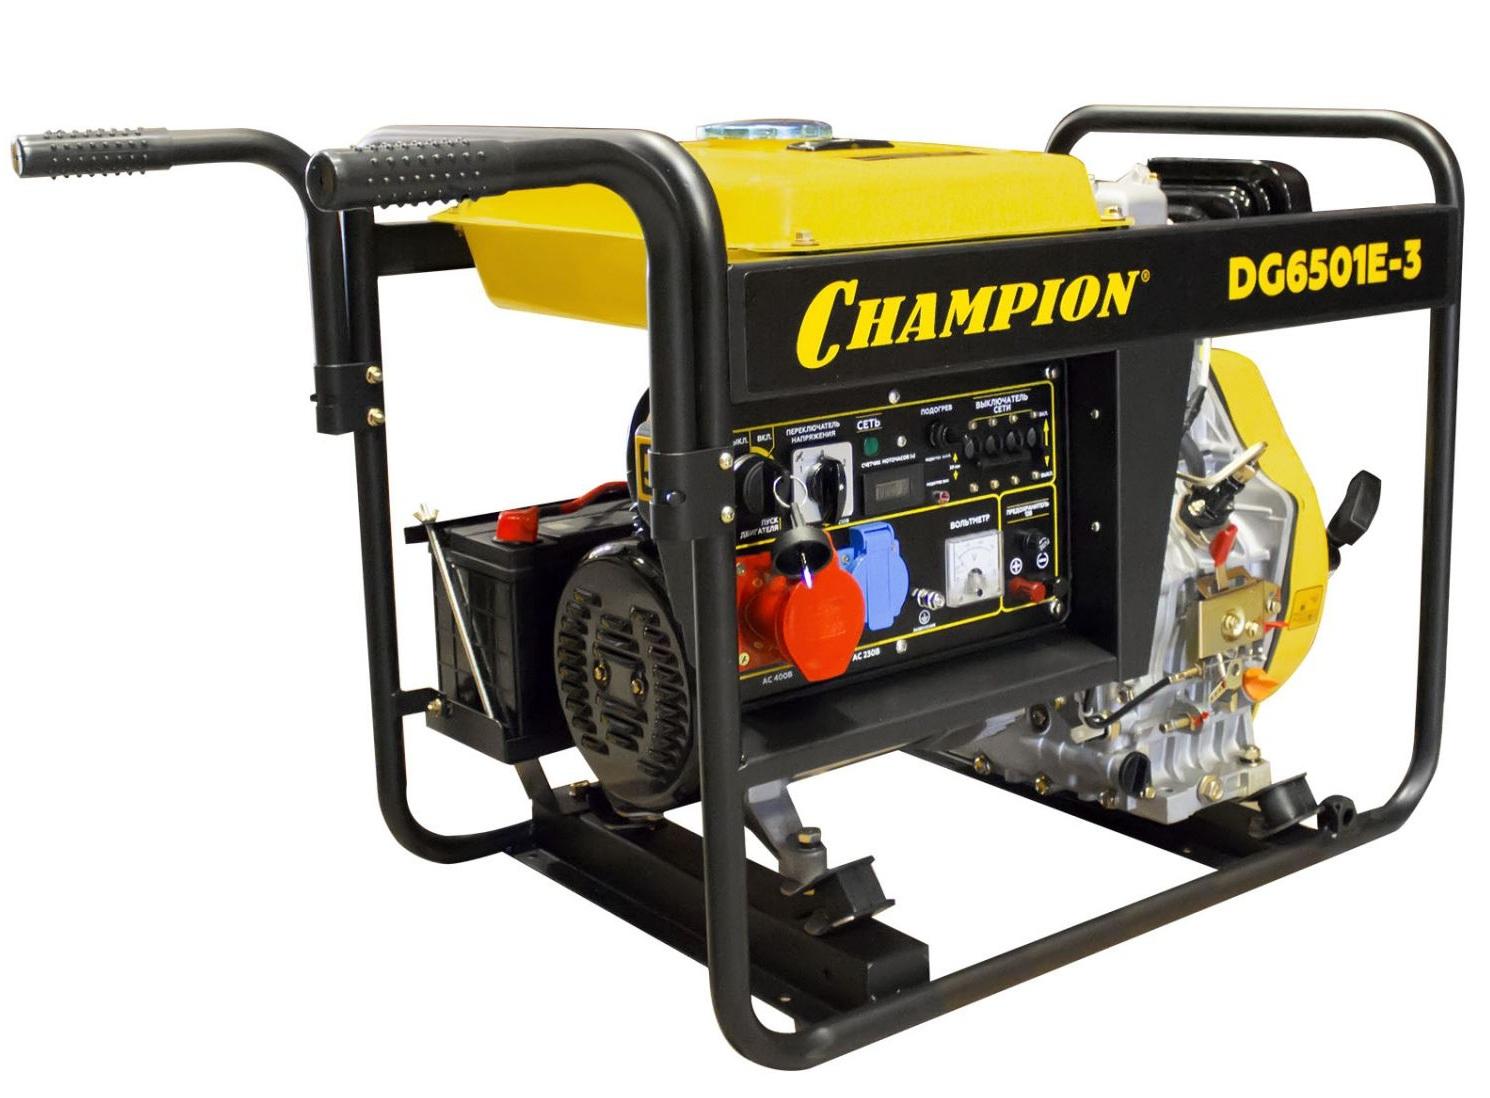 дизельная электростанция champion dg6501e-3